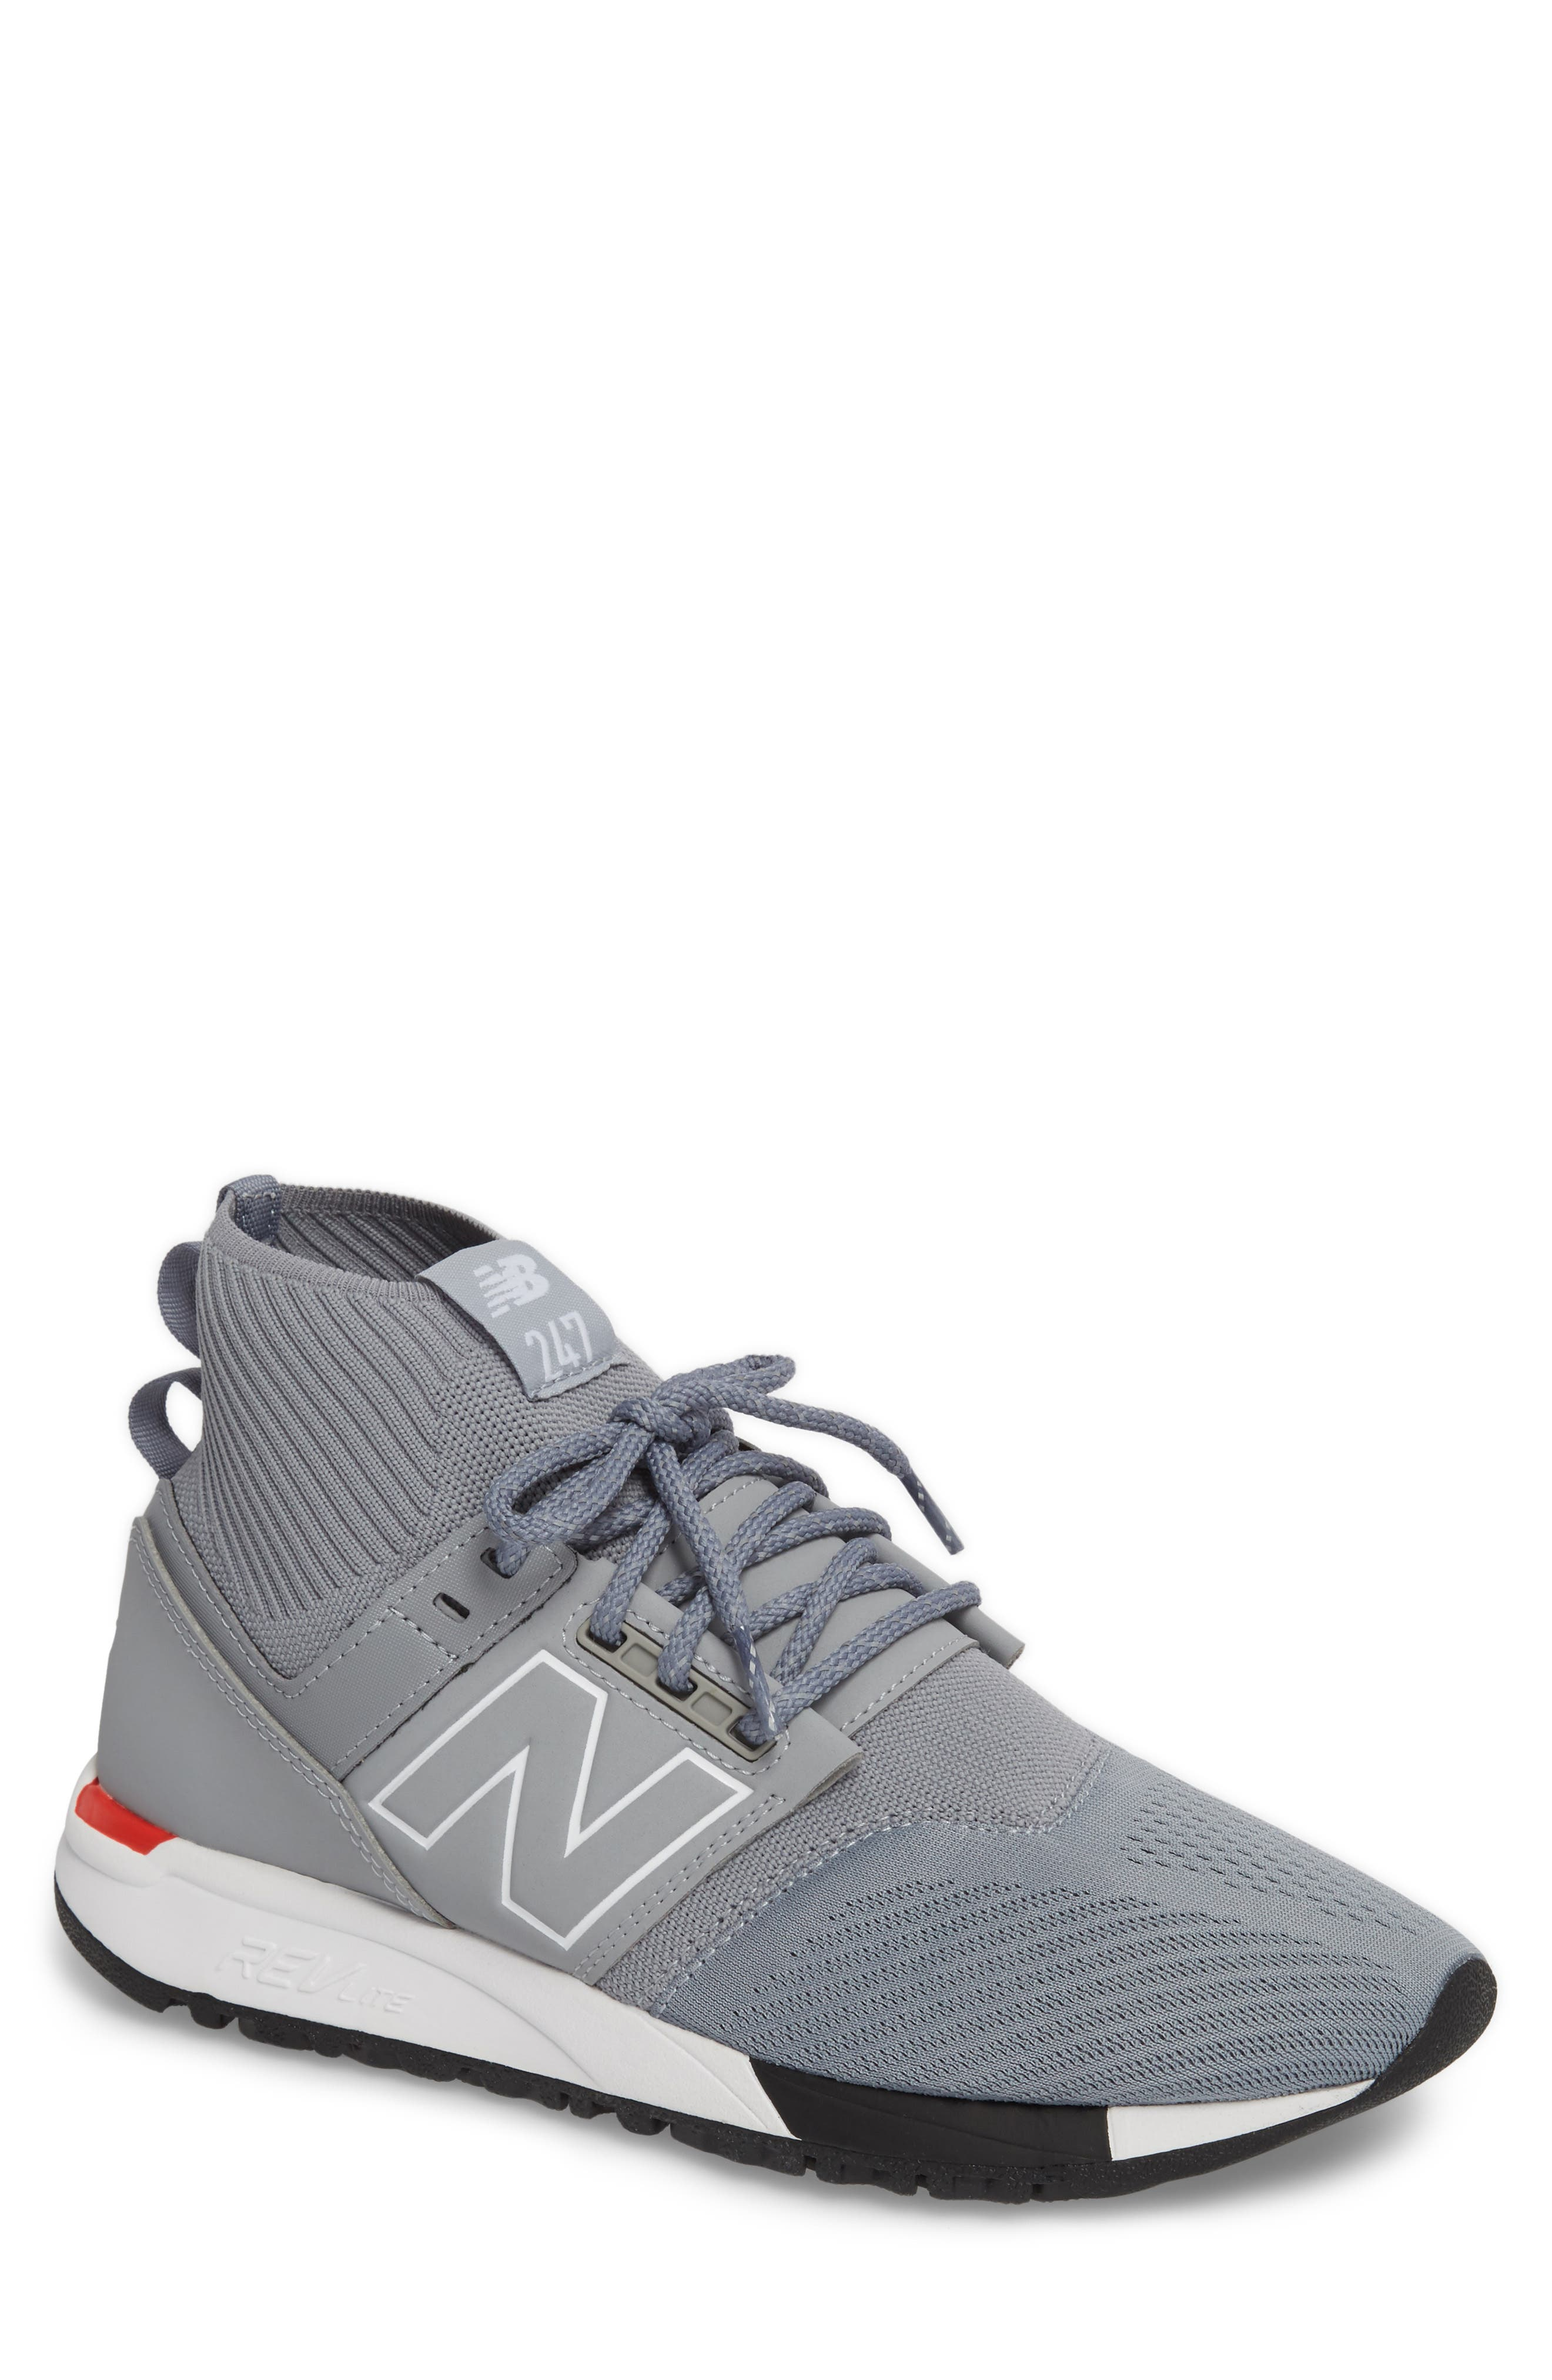 Main Image - New Balance 247 Mid Sneaker (Men)